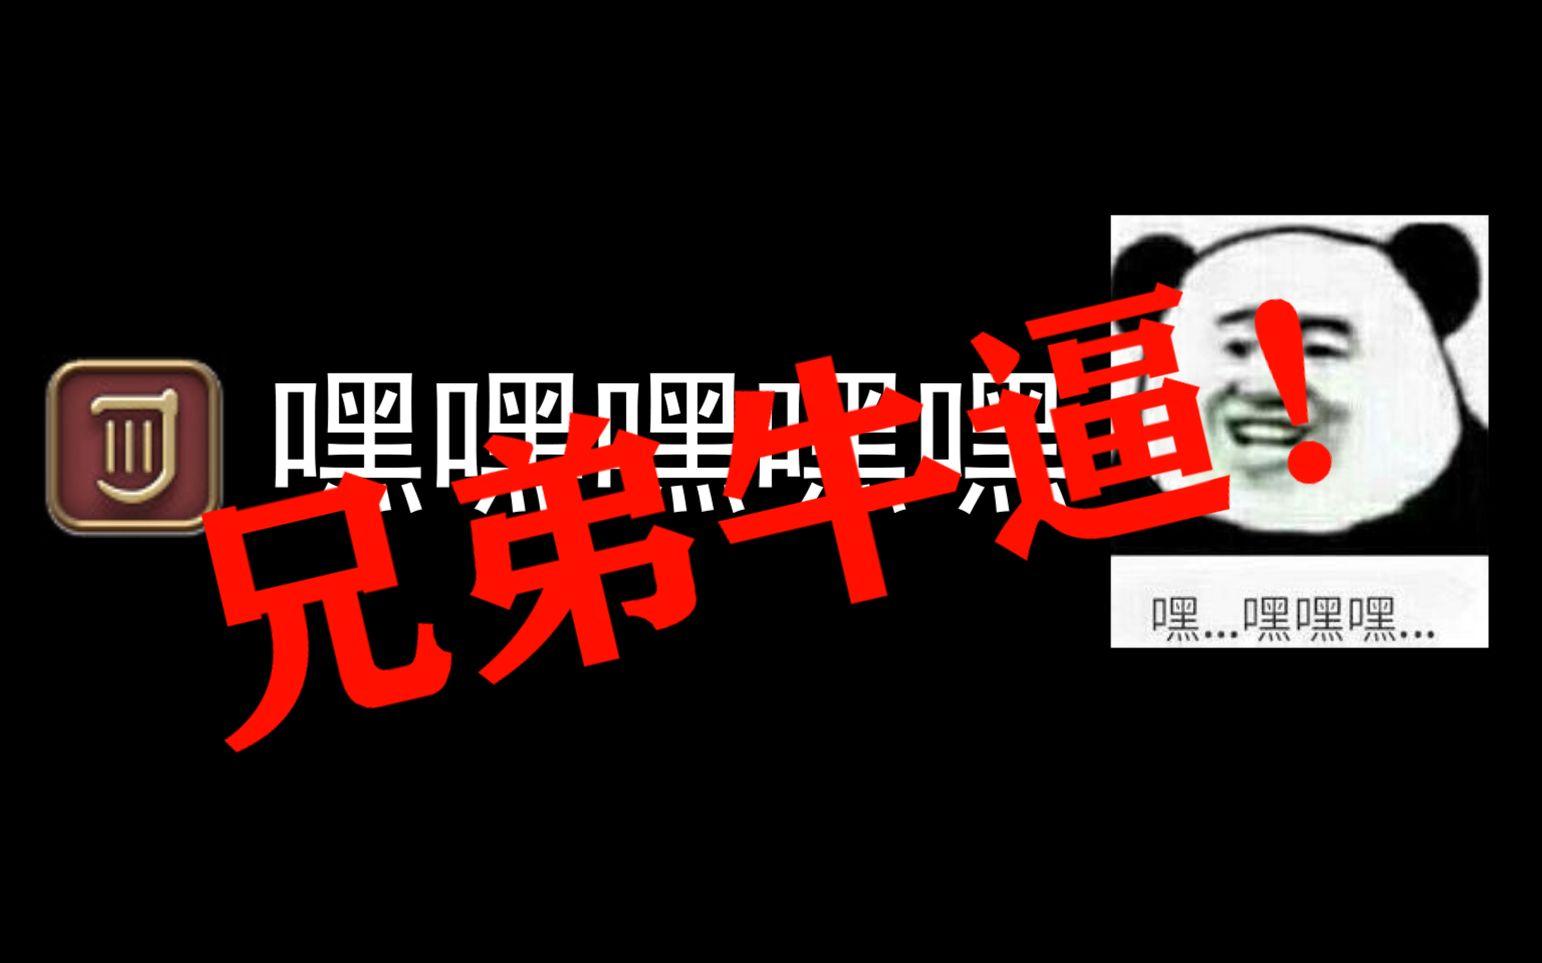 【FF14】新诗人醉酒,兄弟牛逼!